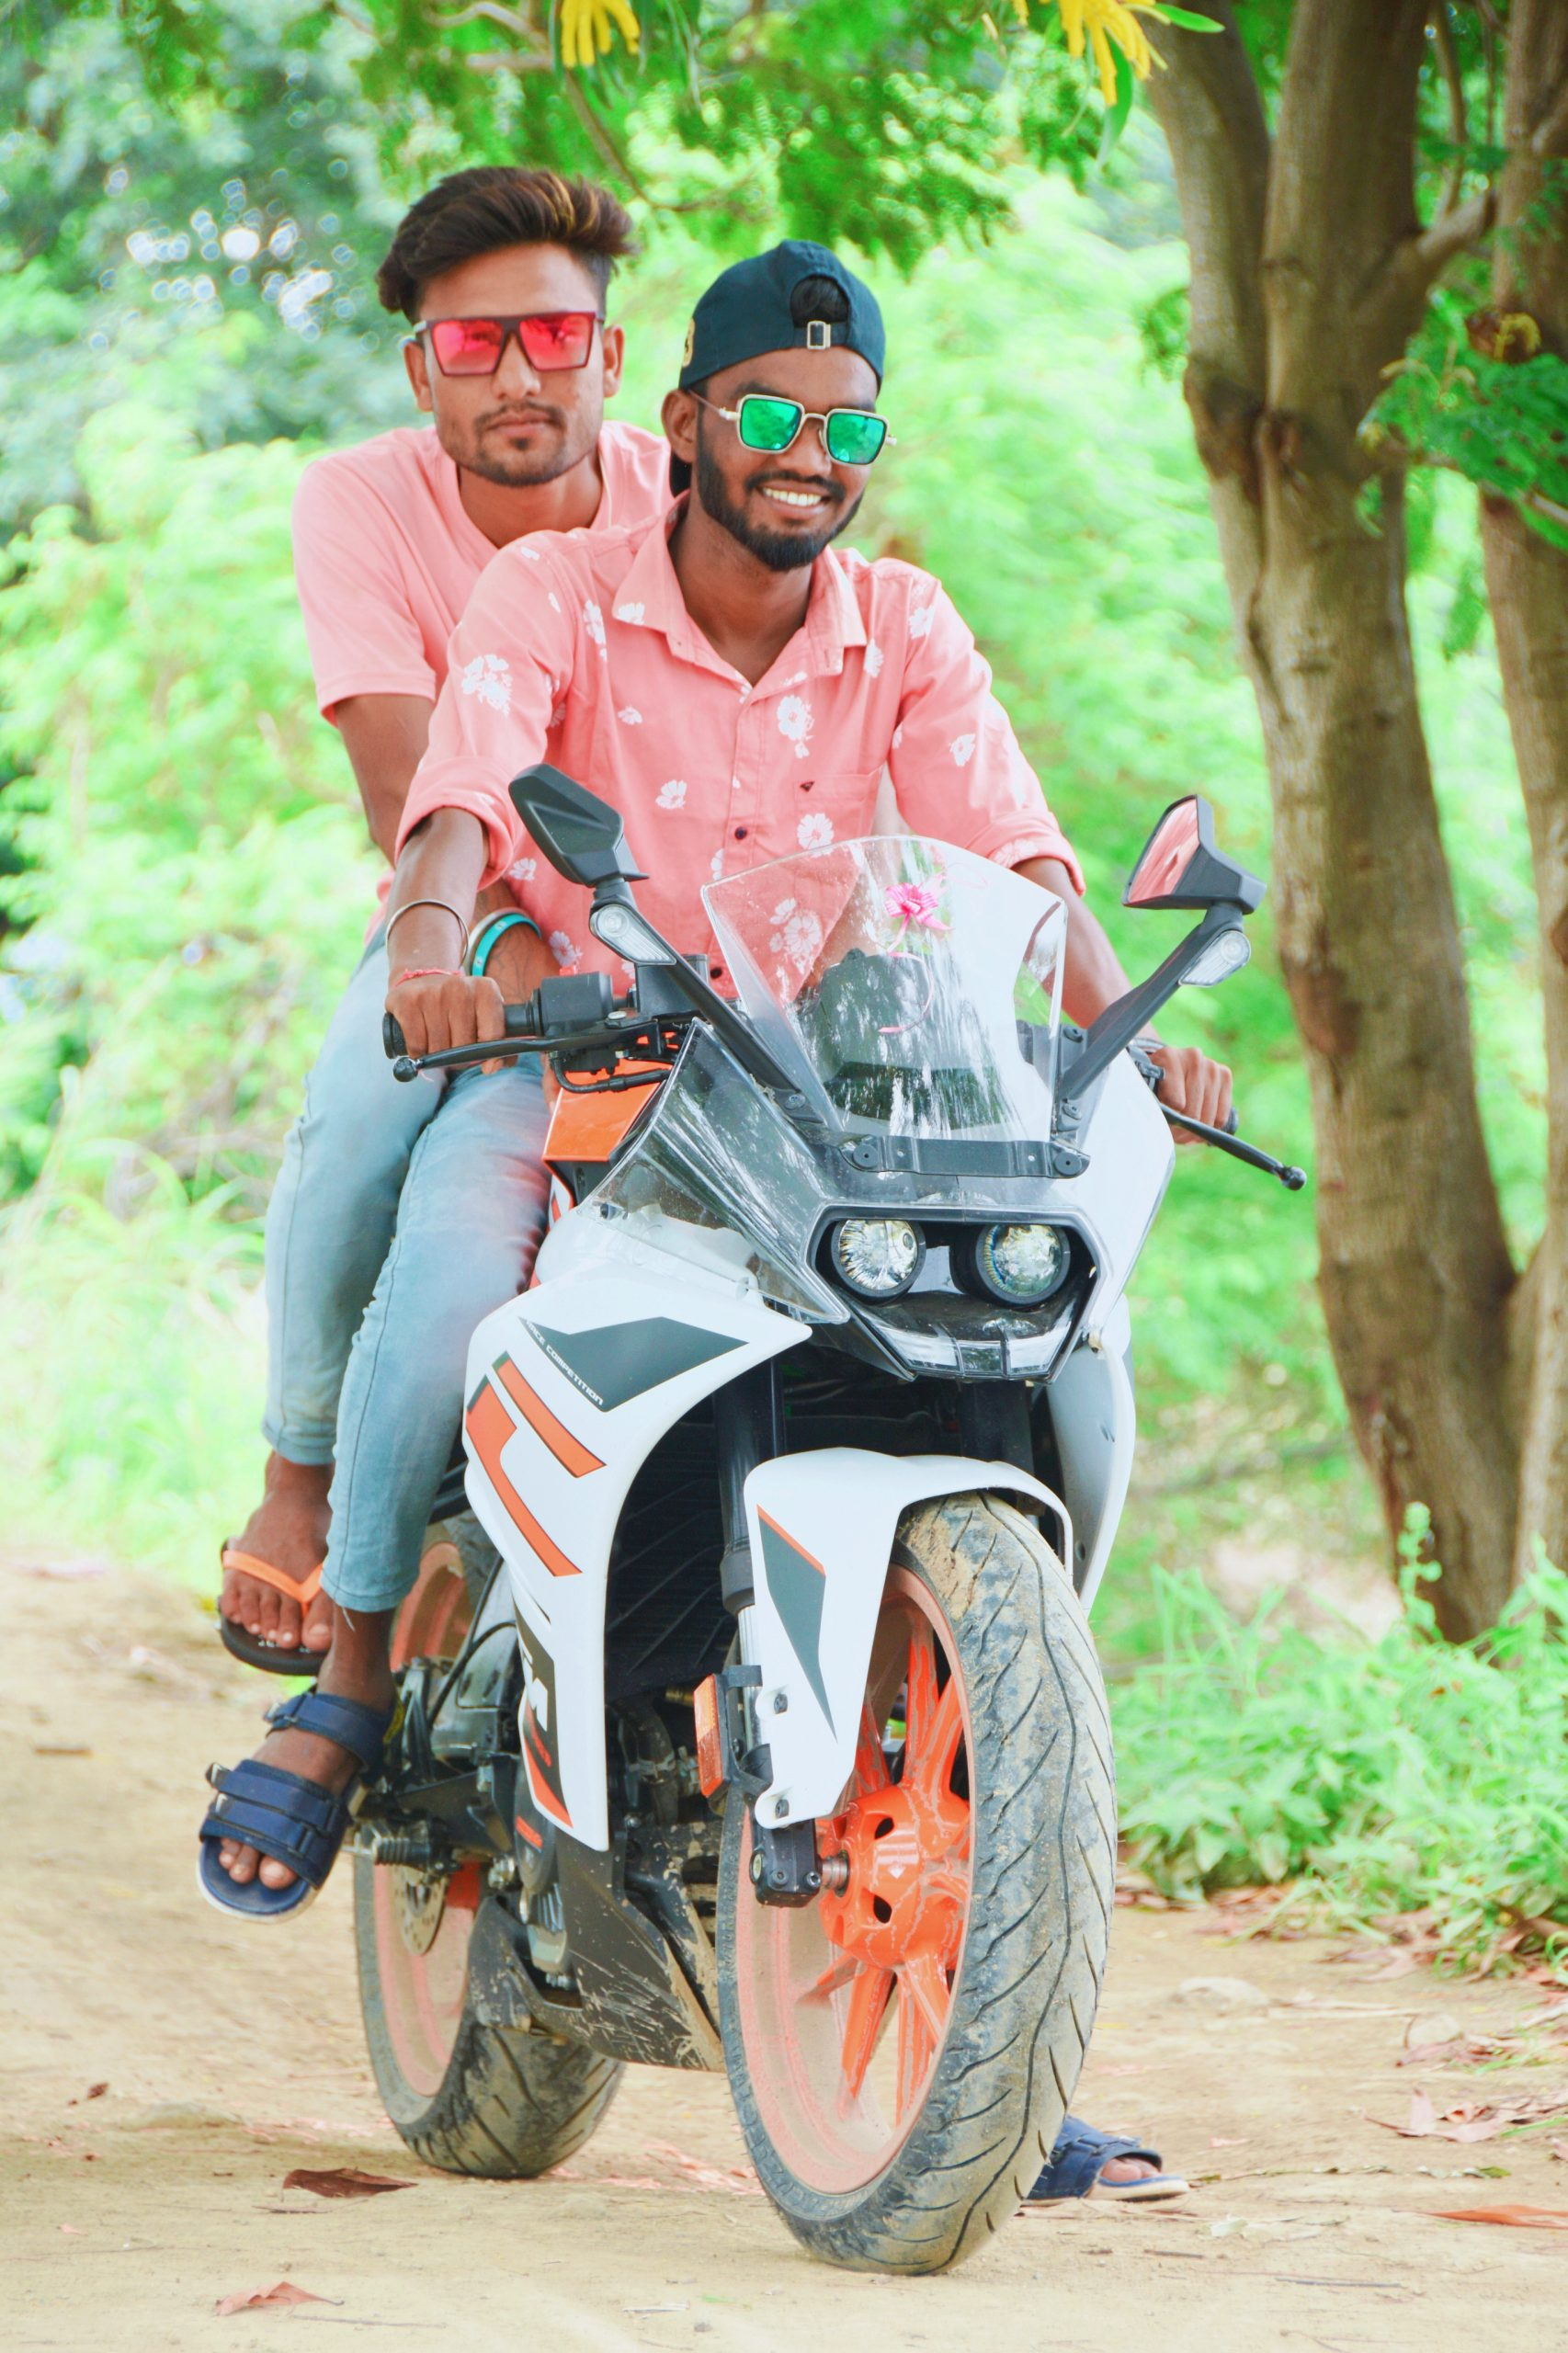 Boys posing on KTM bike